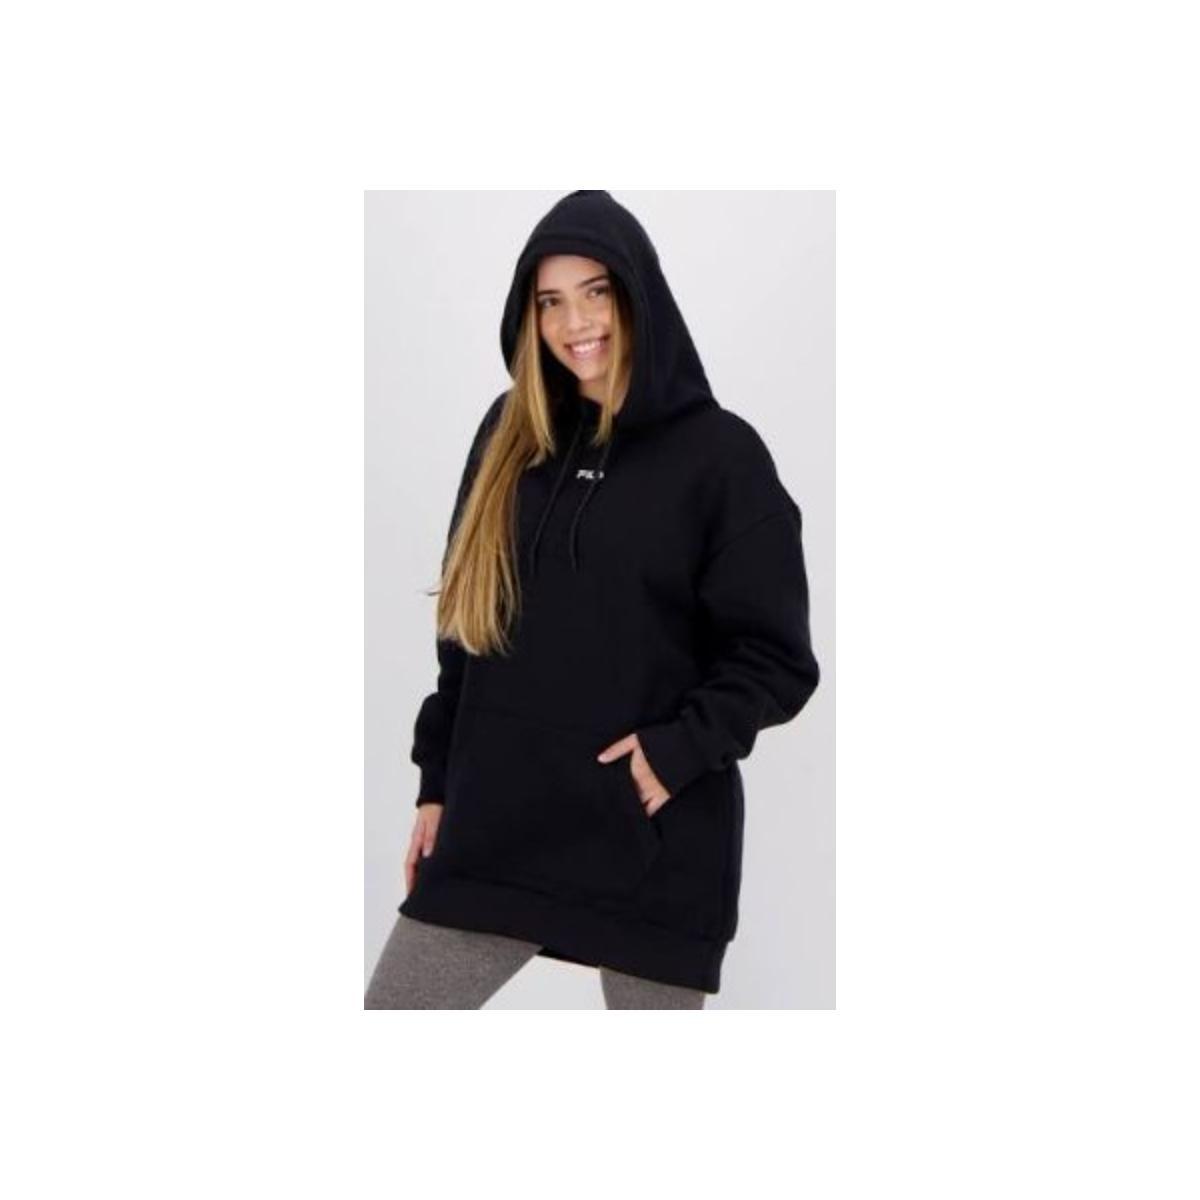 Blusão Feminino Fila F12l523010.160 Max Soft Preto